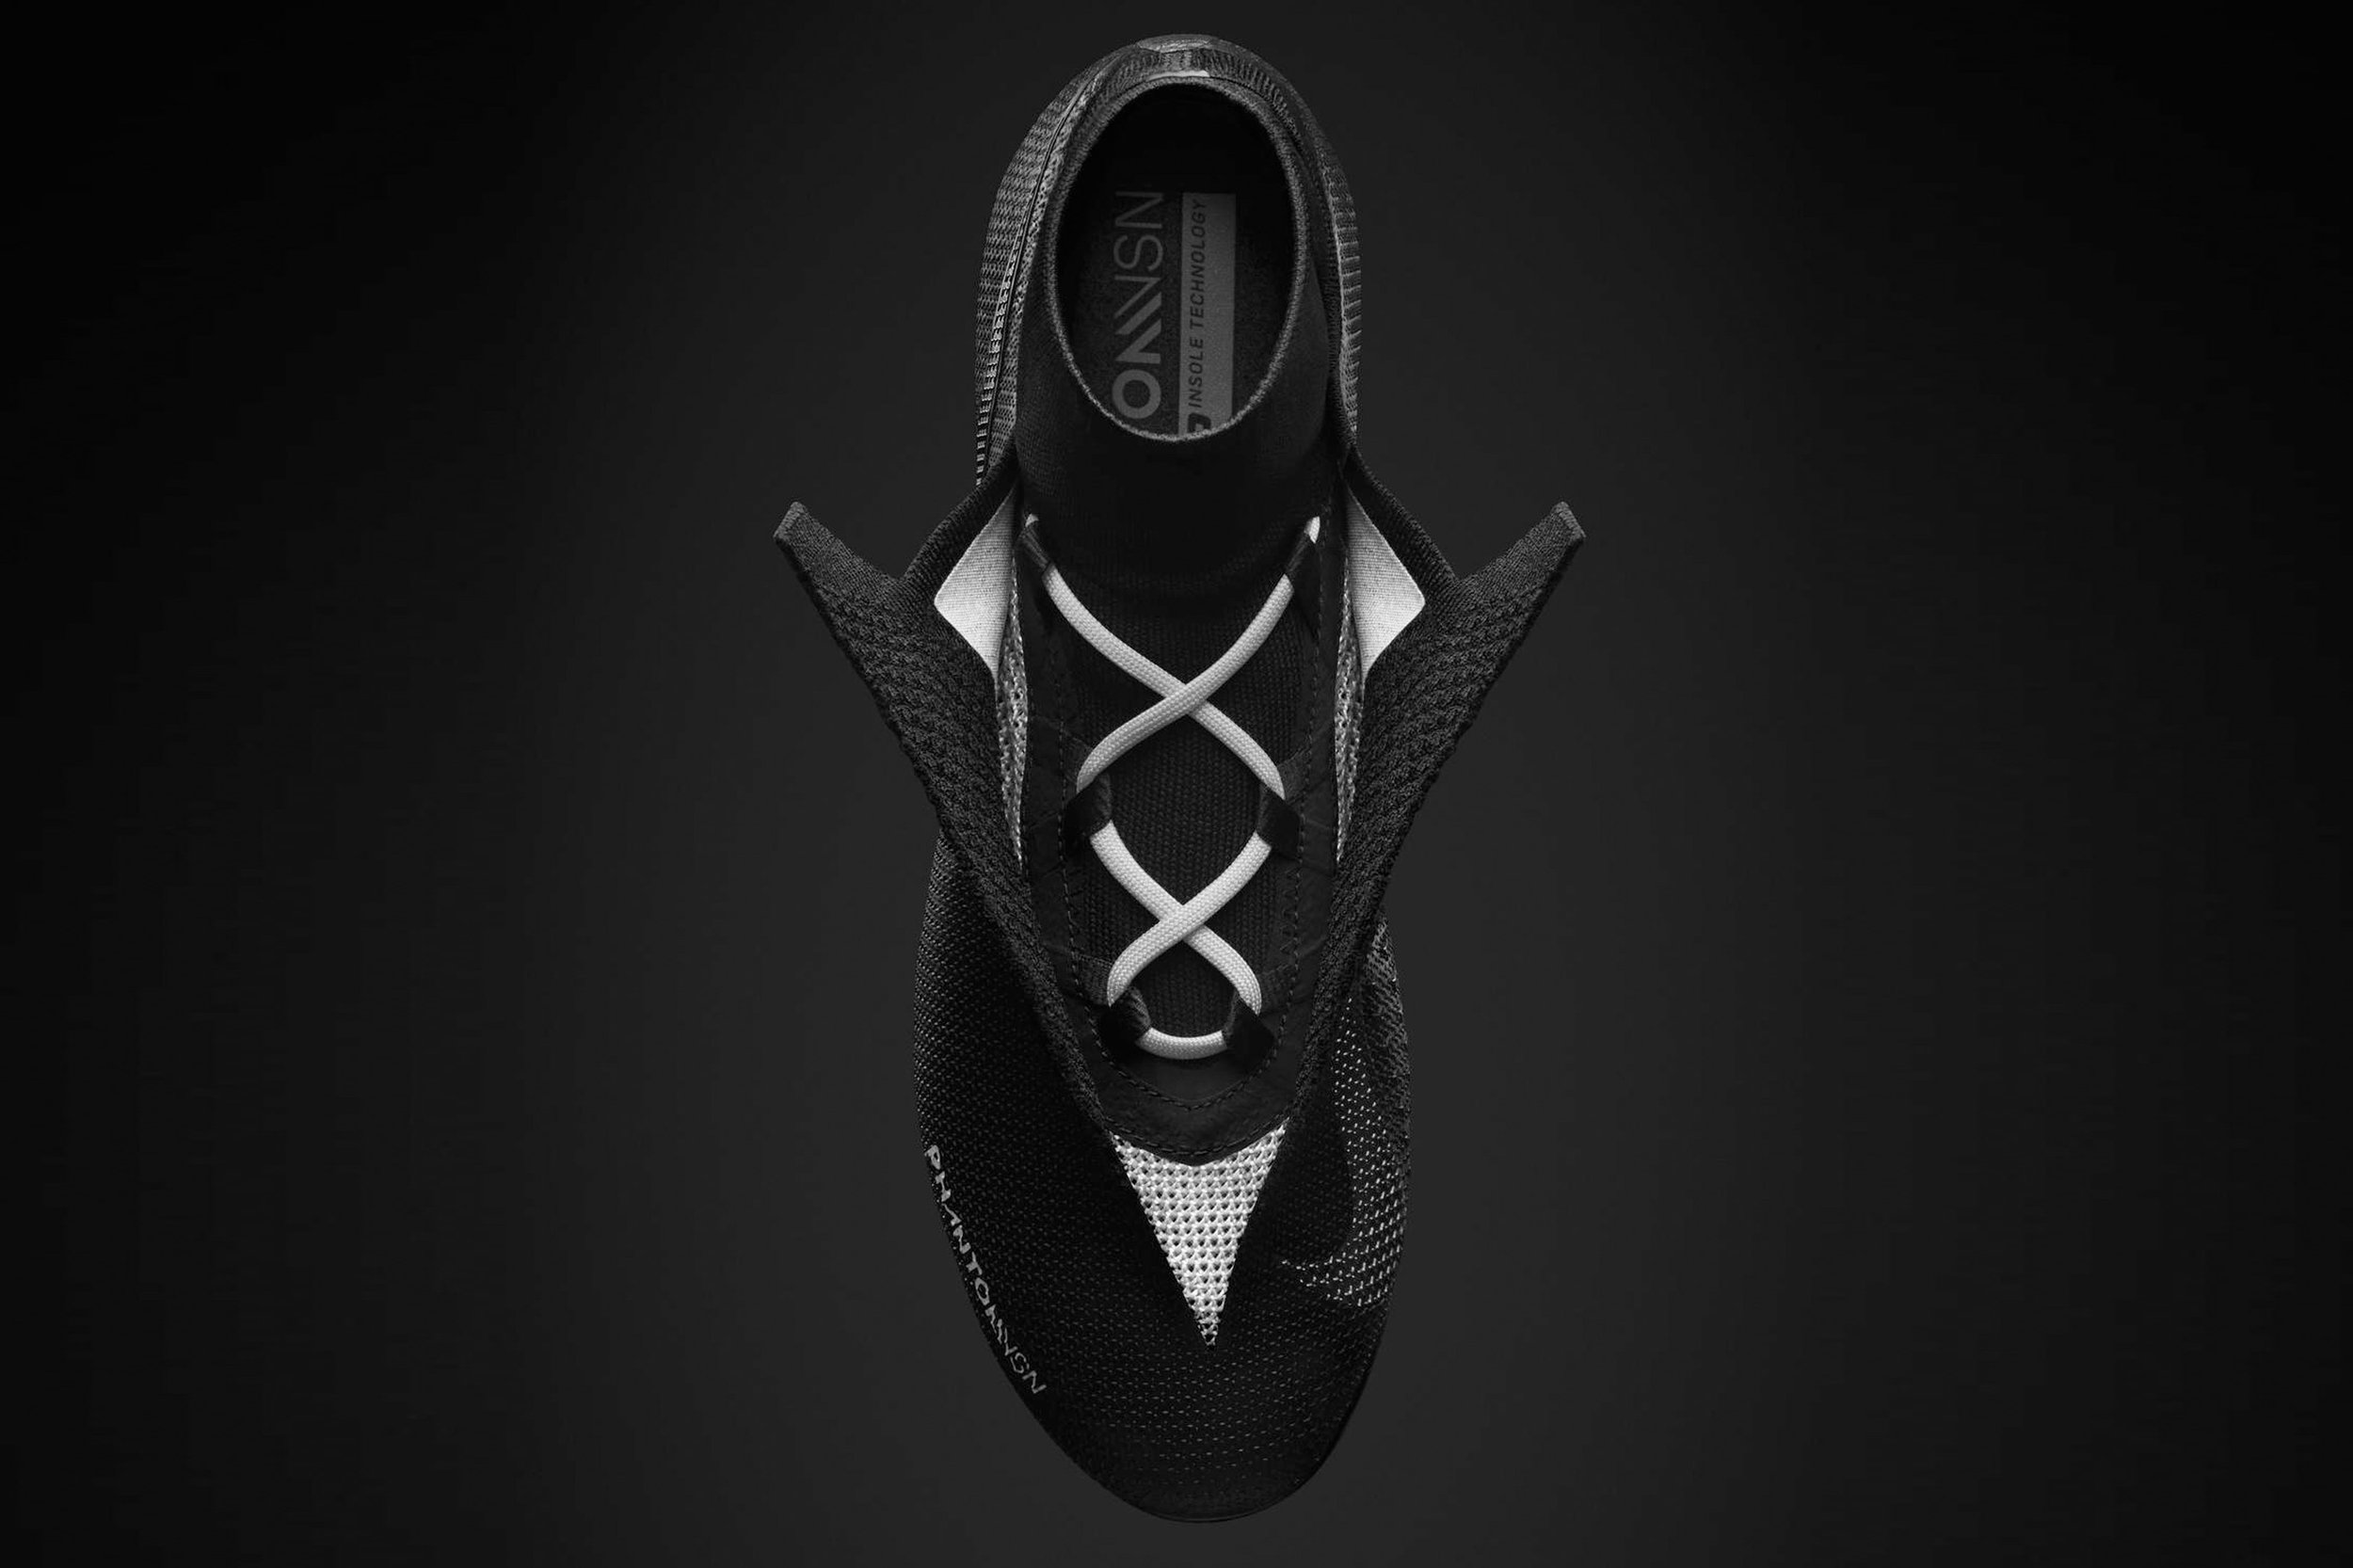 nike-phantom-football-boot-design_dezeen_2364_col_3.jpg